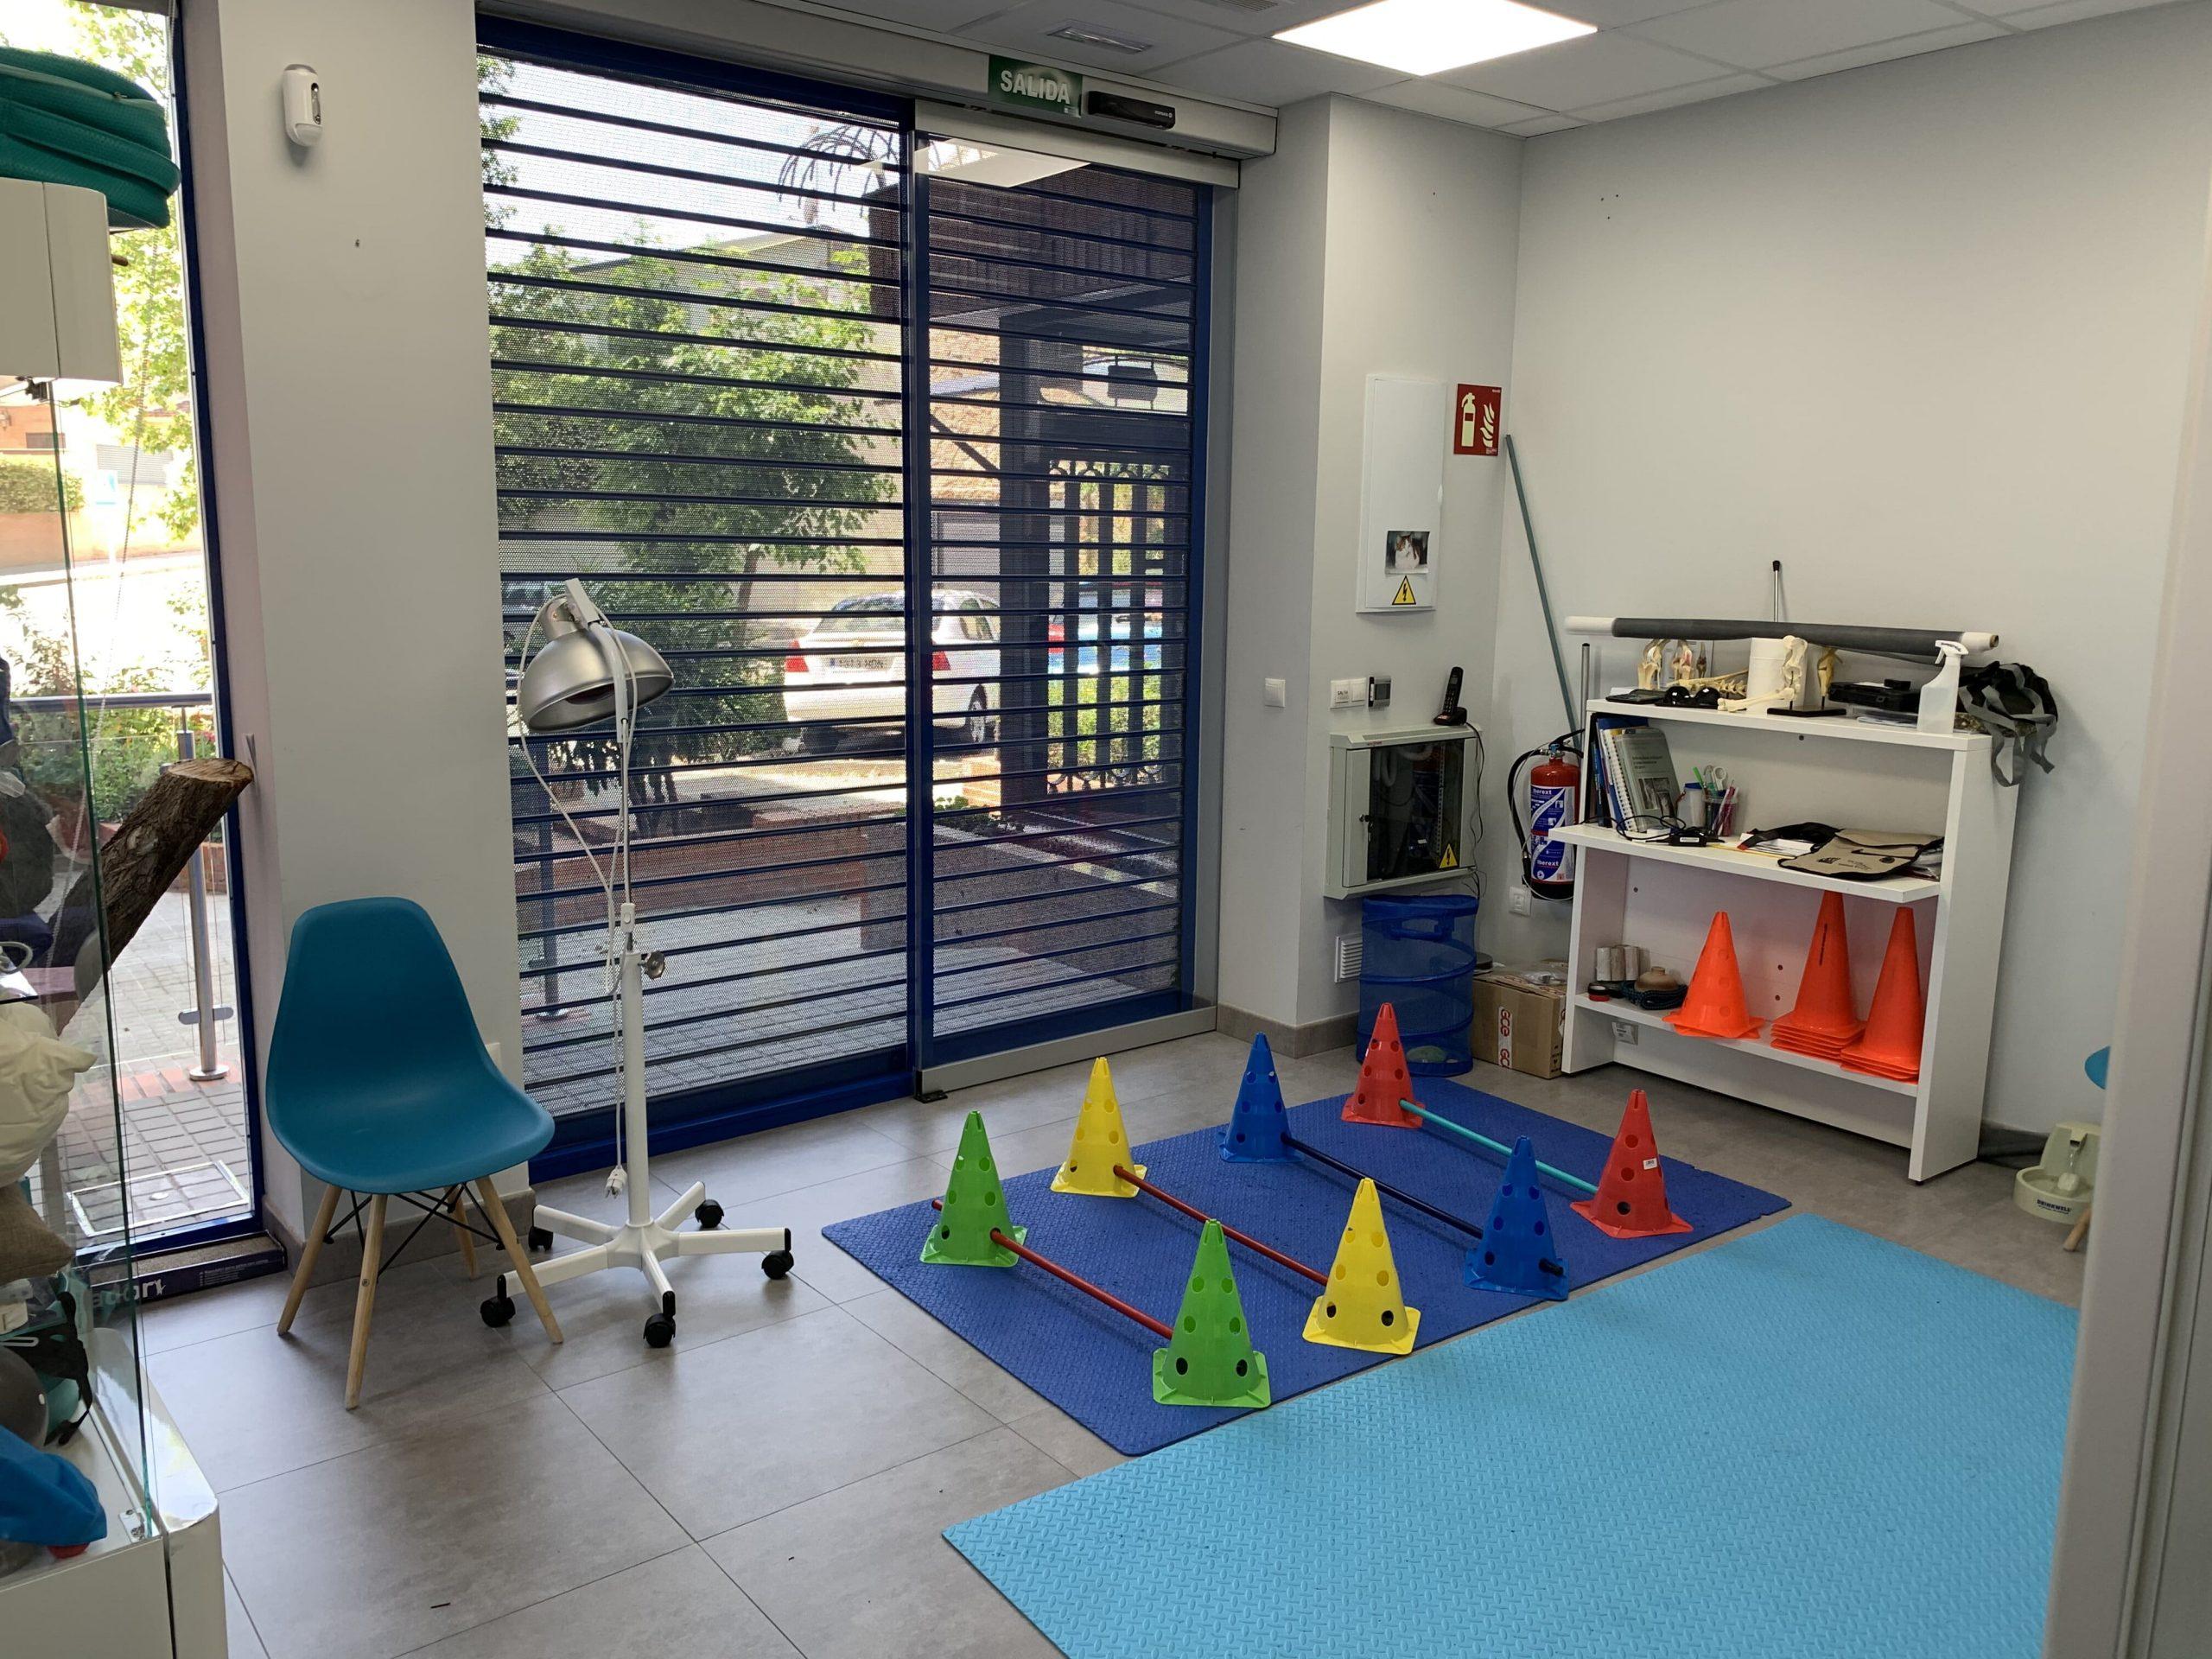 Rehabilitación veterinaria